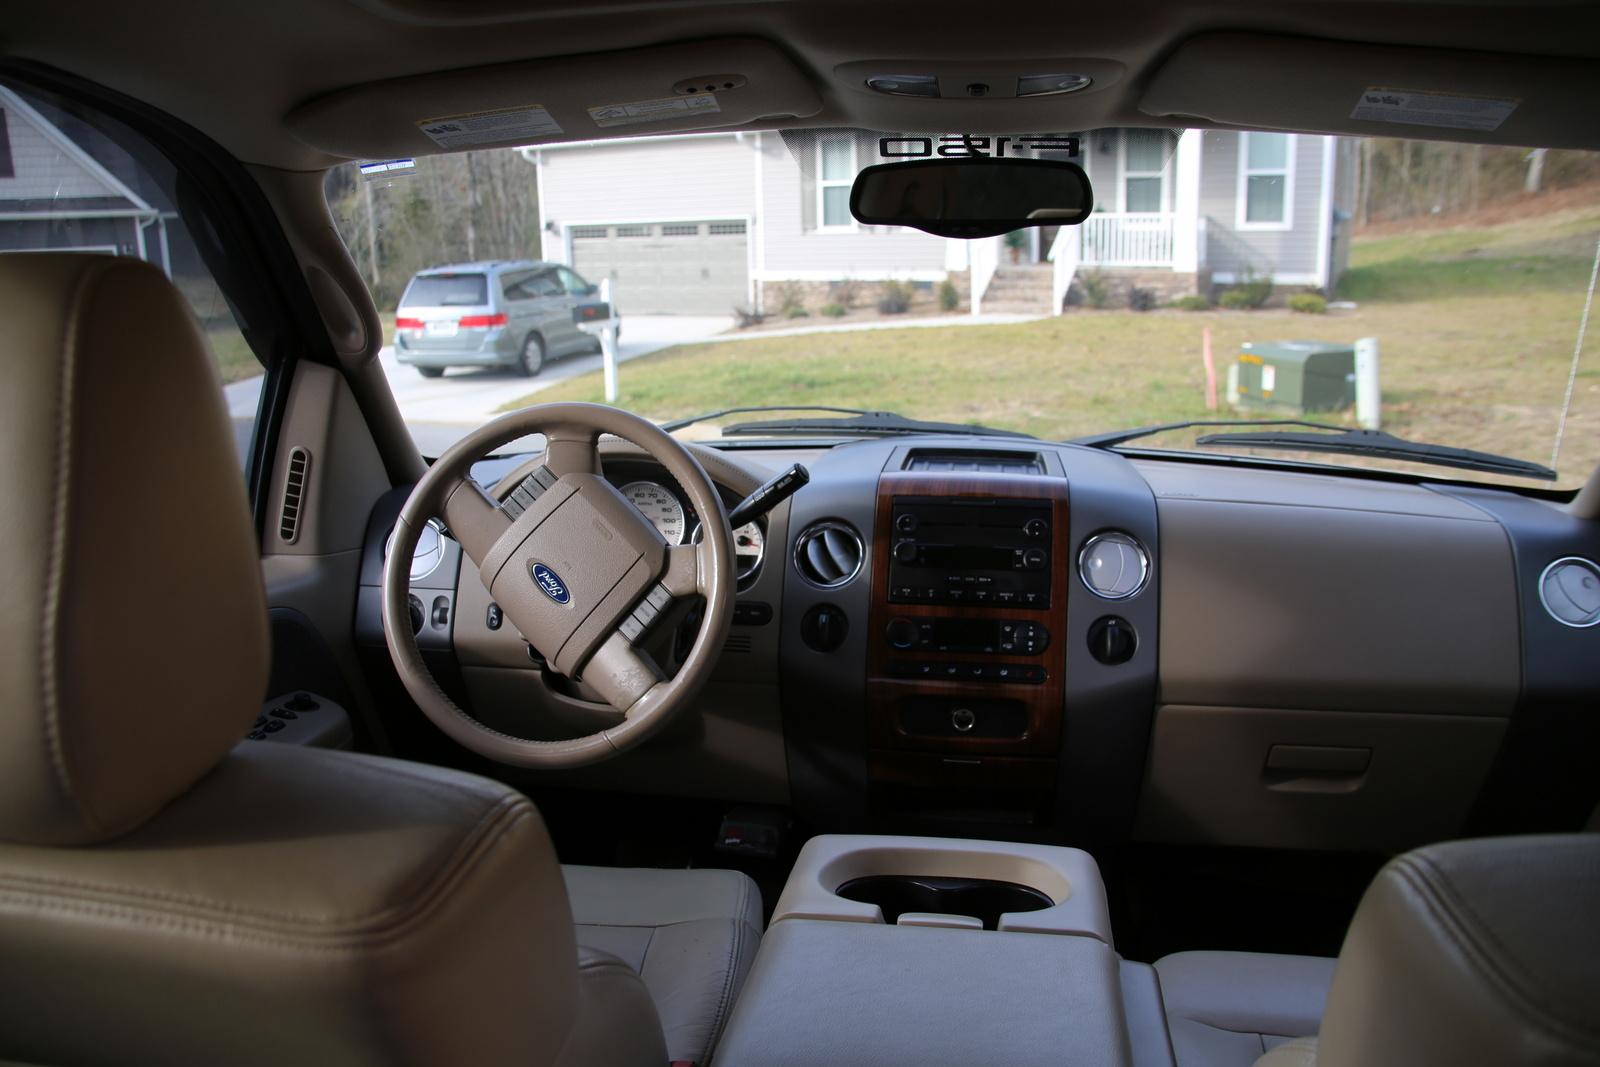 ford f 150 in car gurus 2004 autos post. Black Bedroom Furniture Sets. Home Design Ideas